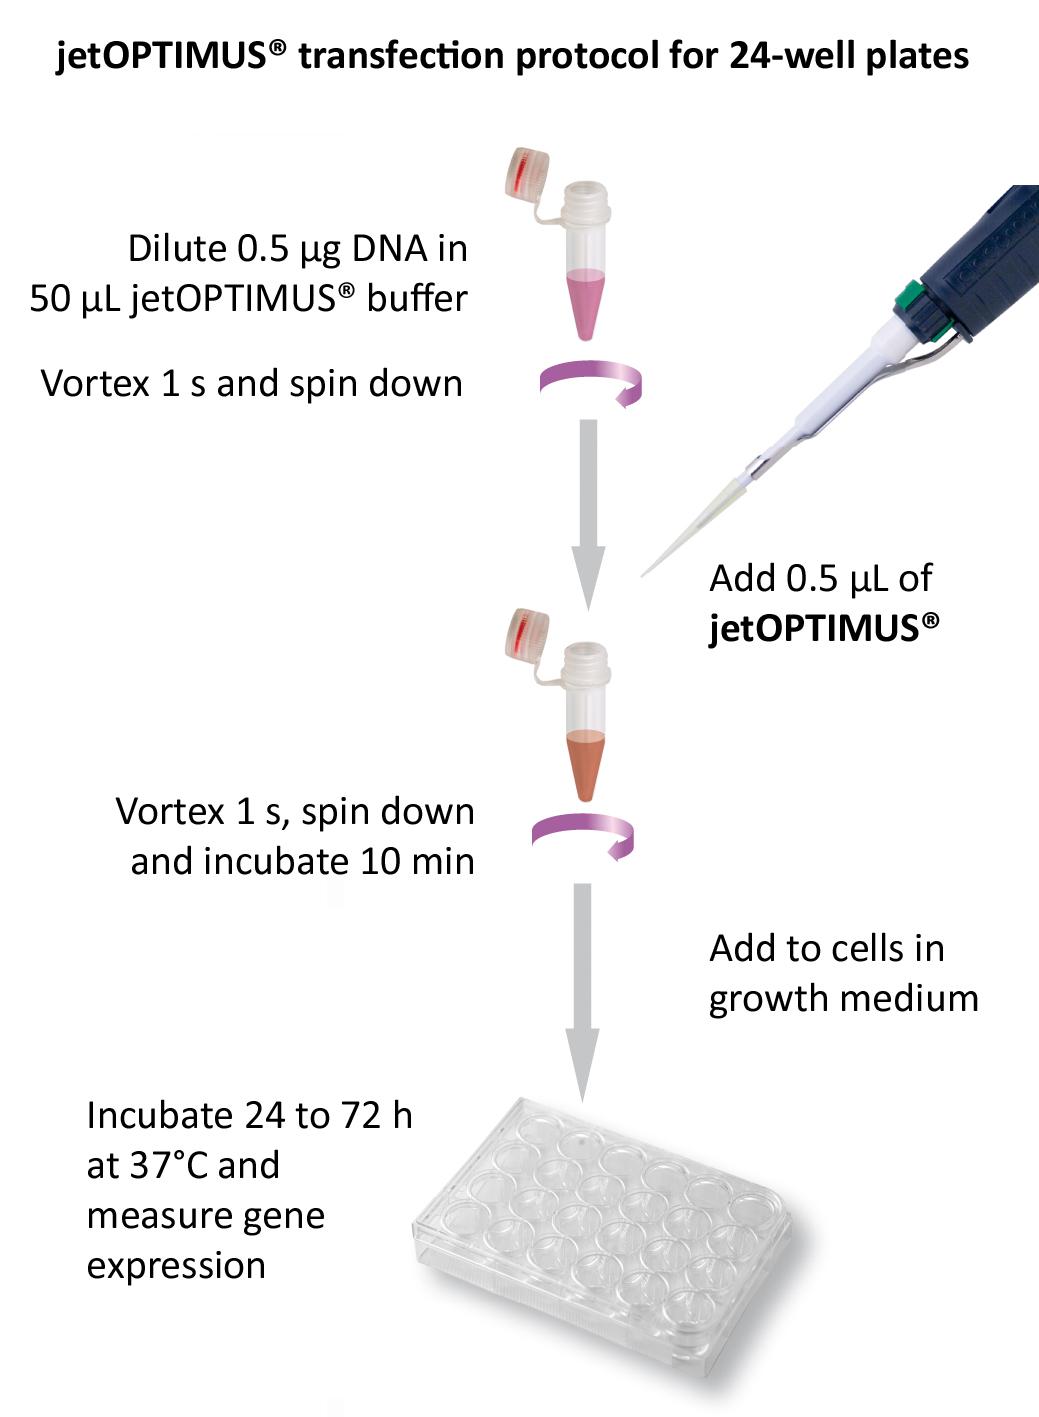 jetOPTIMUS - Protocol